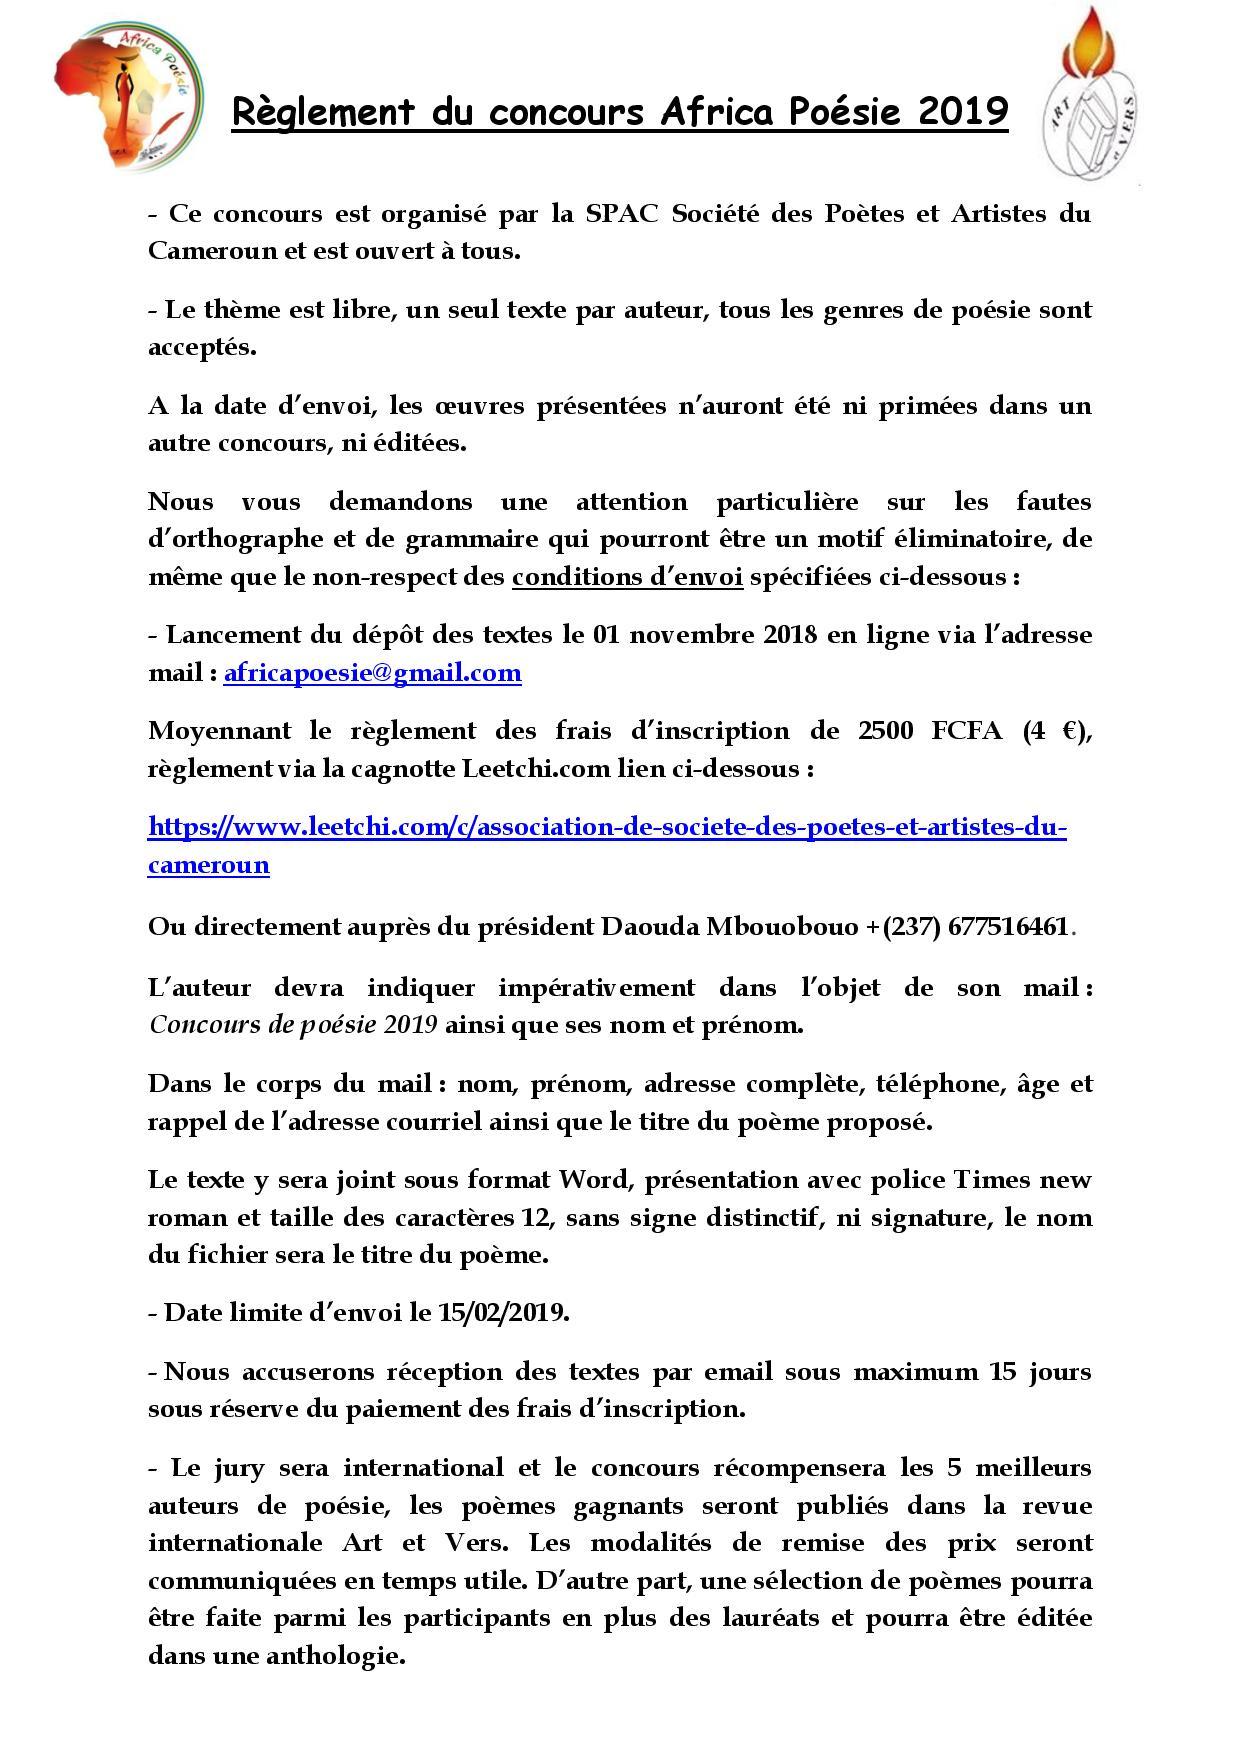 Reglement du concours africa poesie 2019